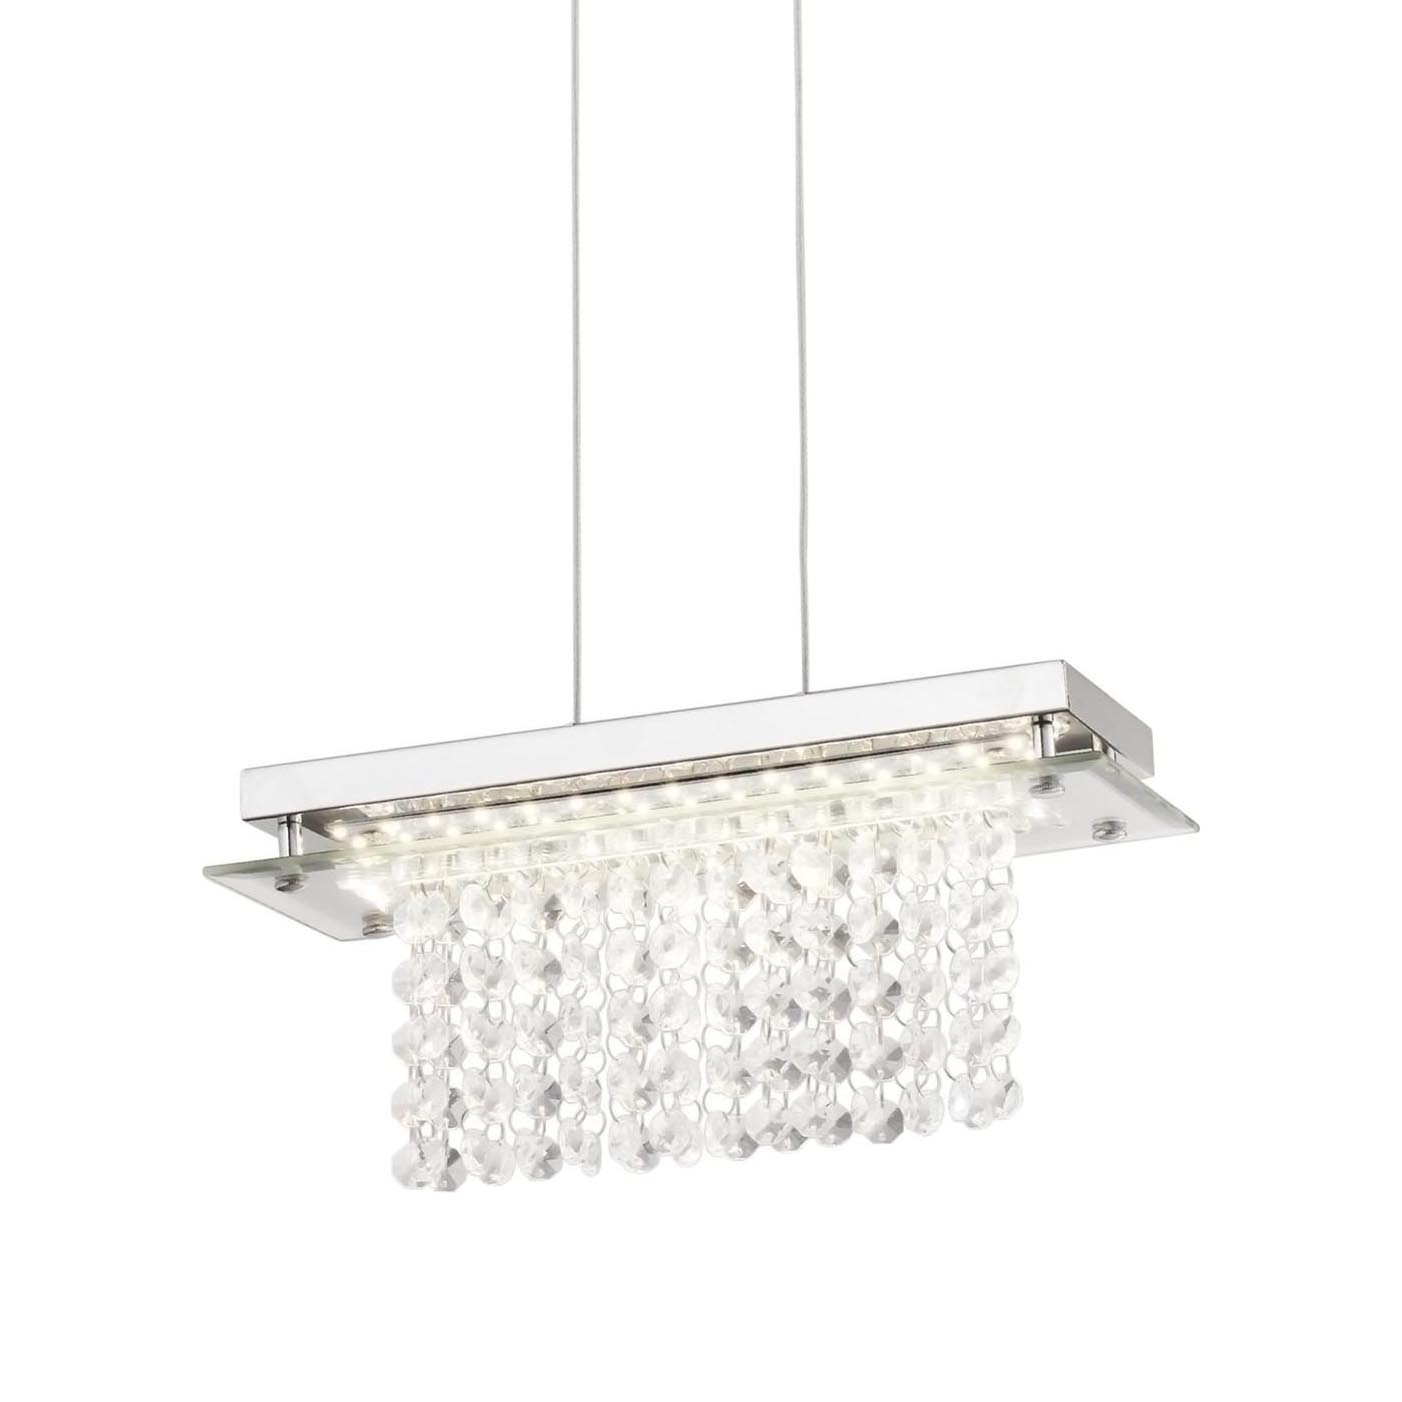 Pendente Cristal LED Versalhes Retangular 30x12cm 12W 4000K QPD887